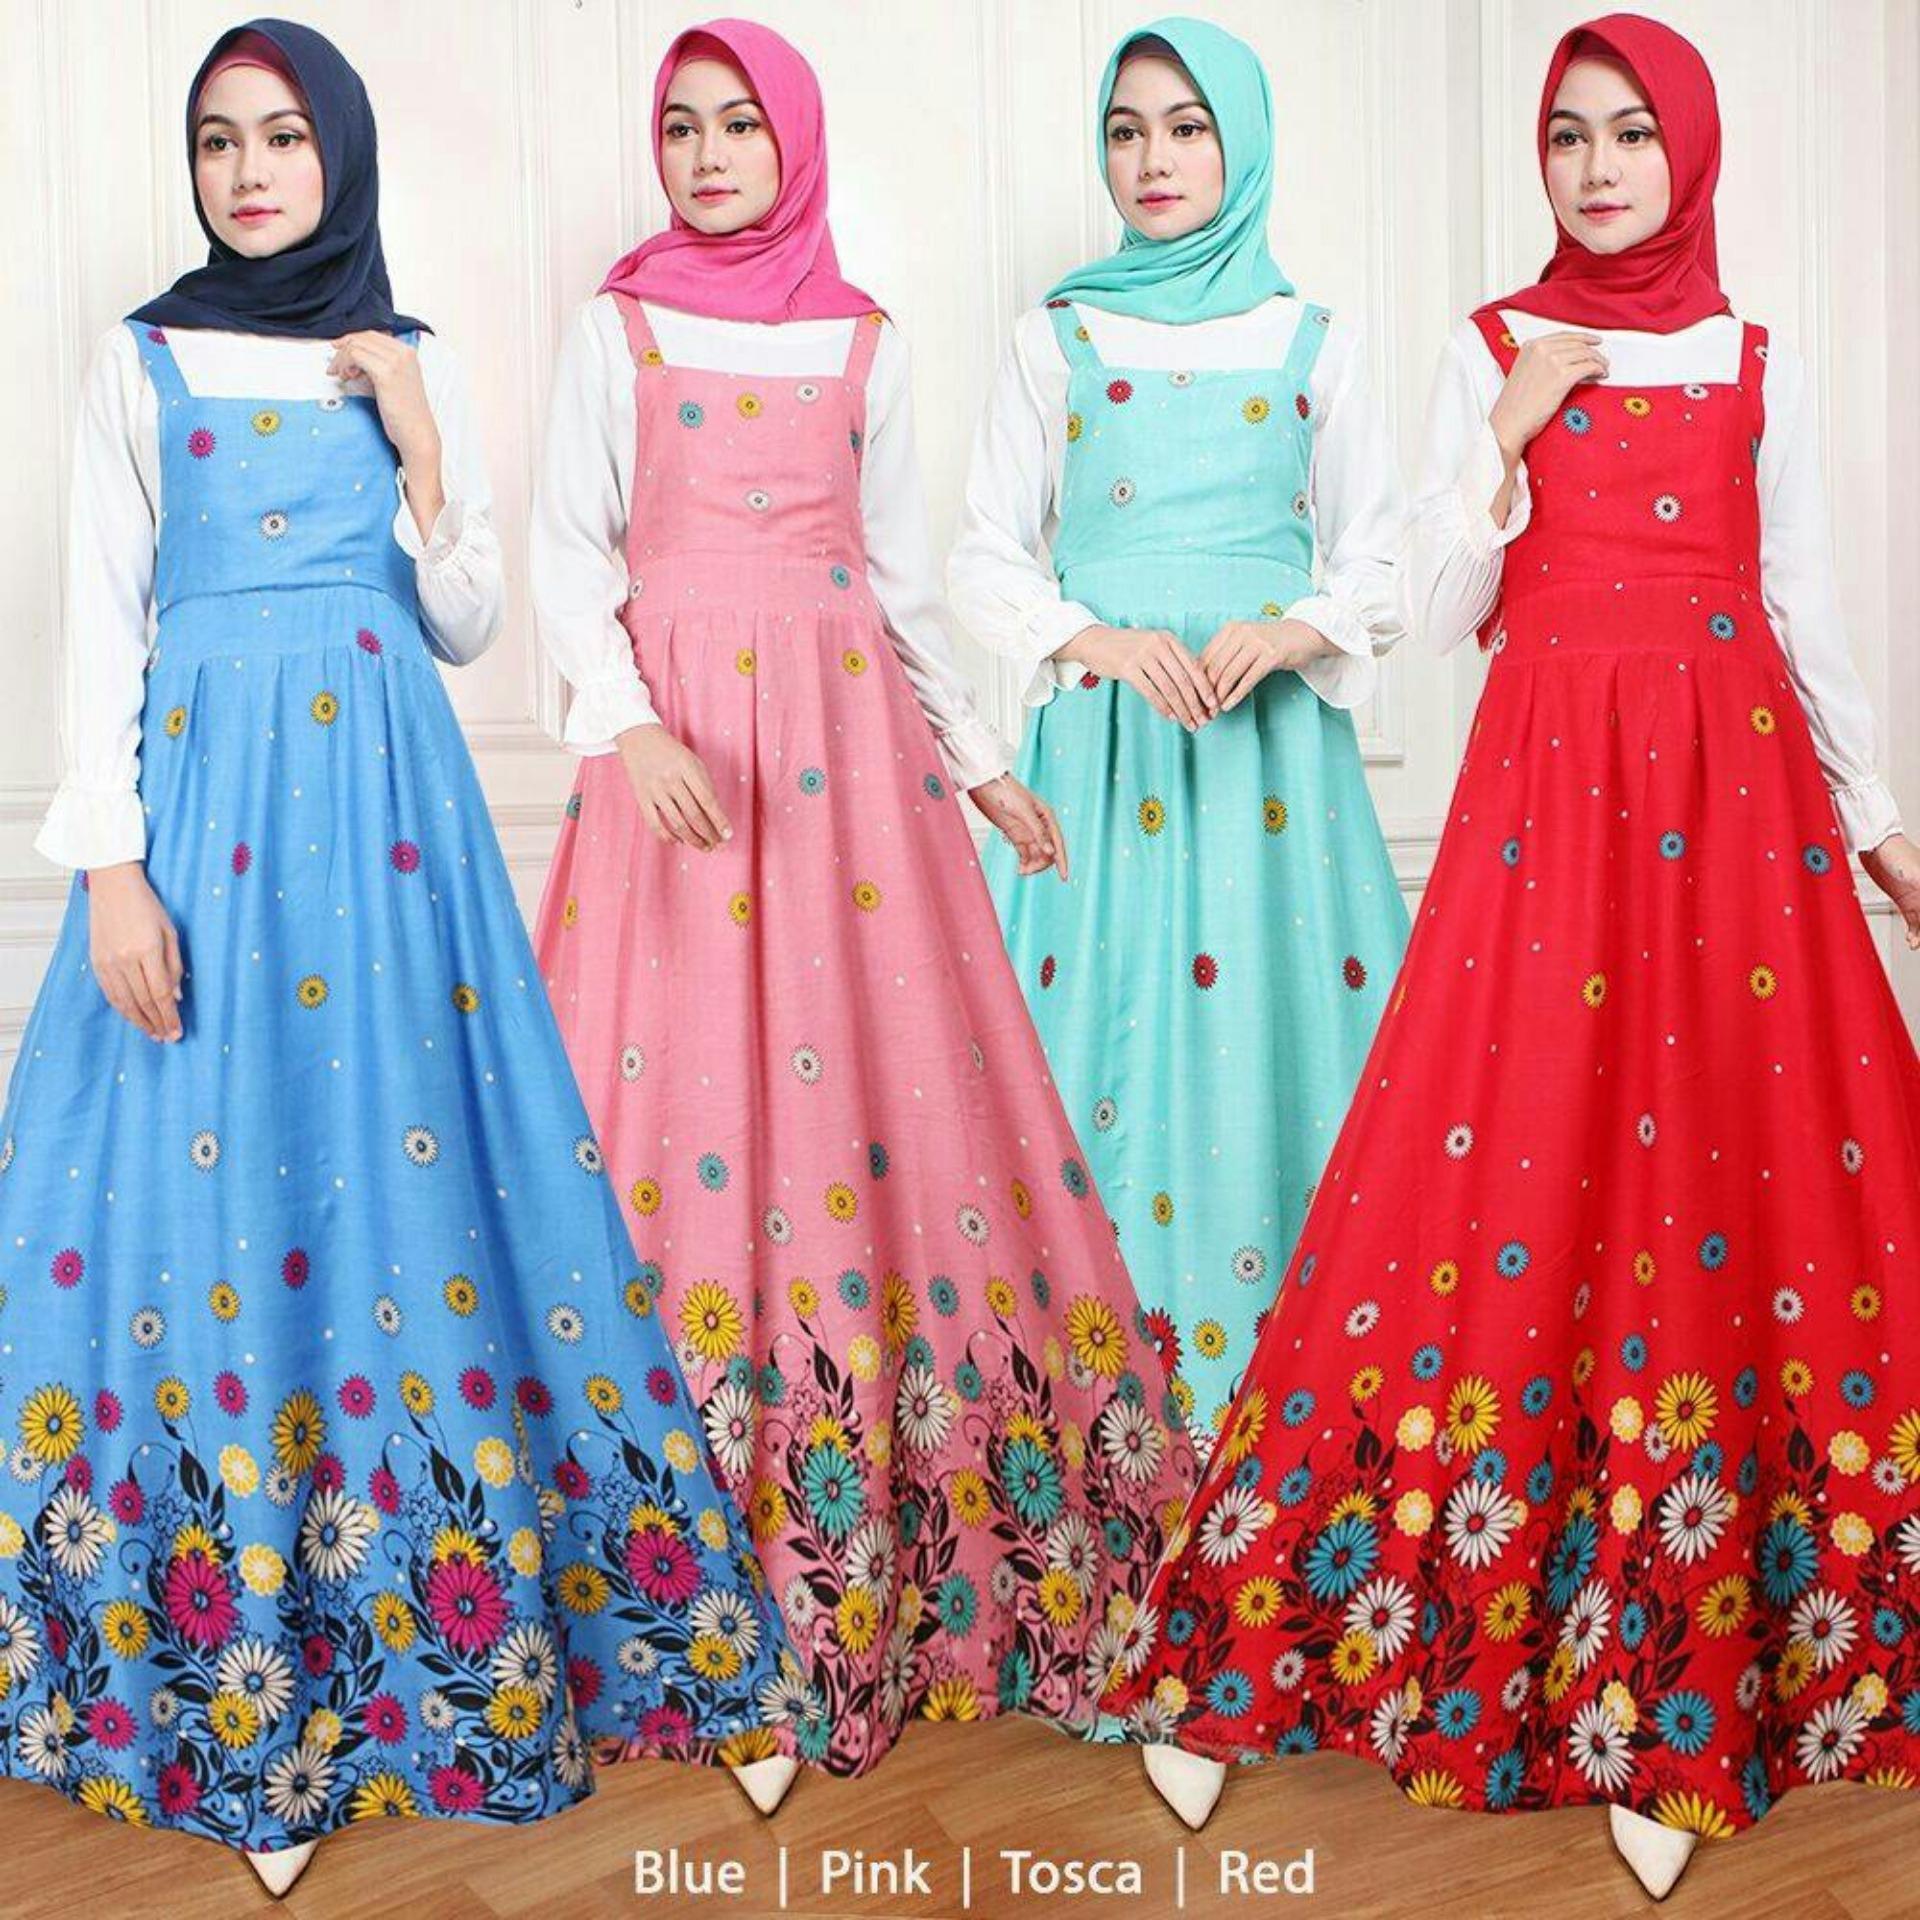 Claryne Maxi Overall Dress Wanita Muslim Lengan Panjang Motif Kembang Kekinian Bianca